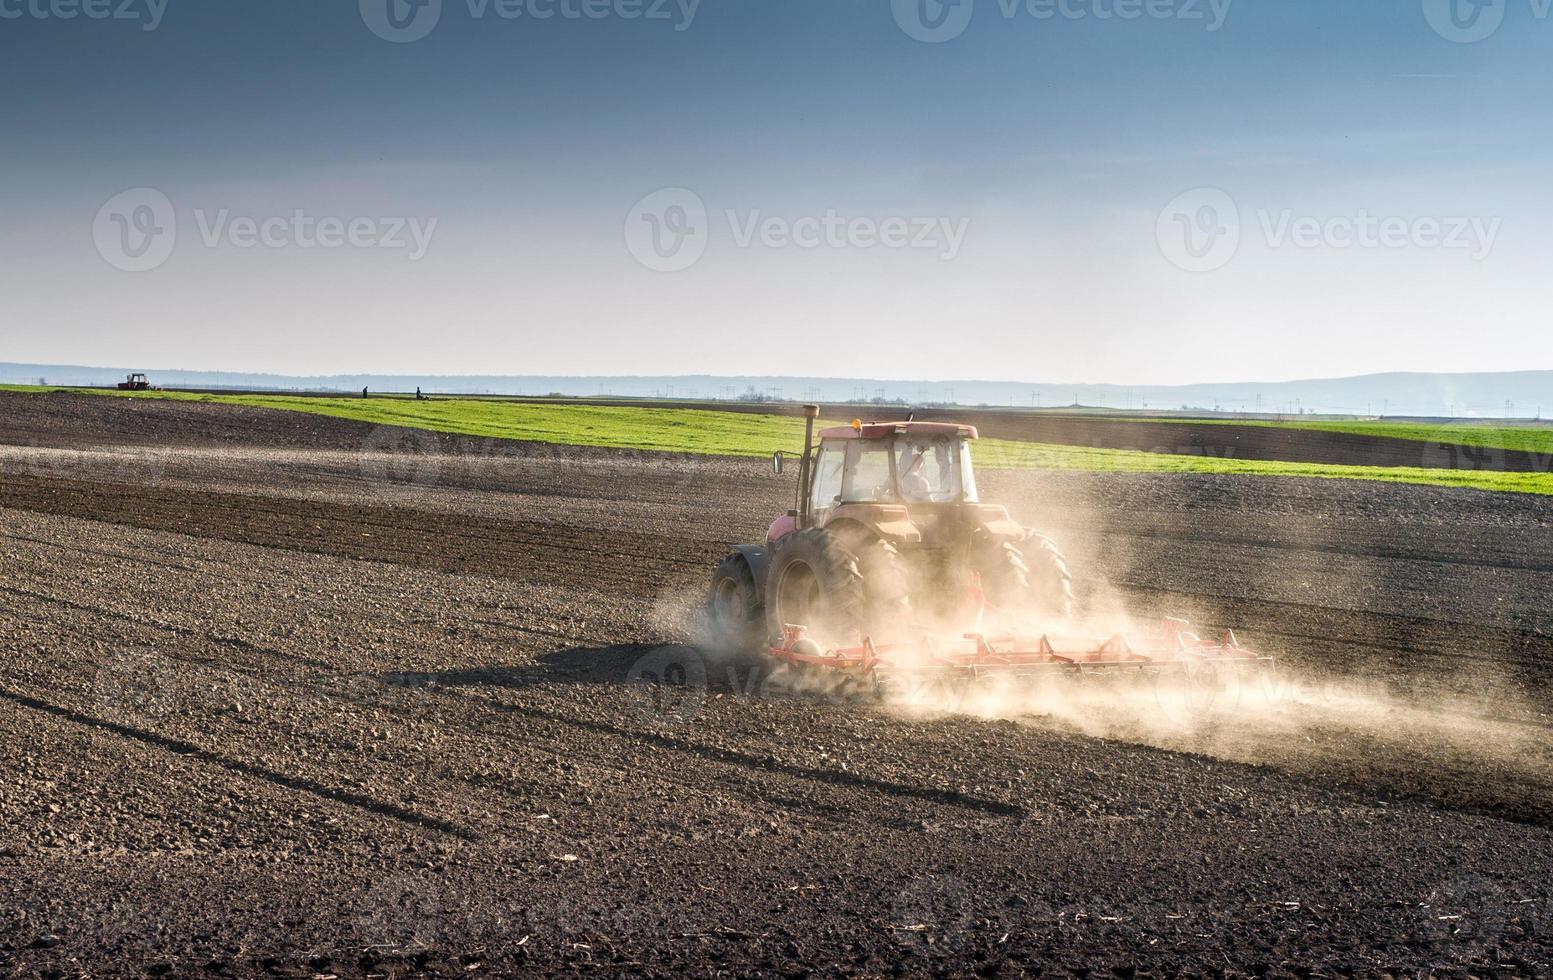 preparando a terra para a semeadura foto